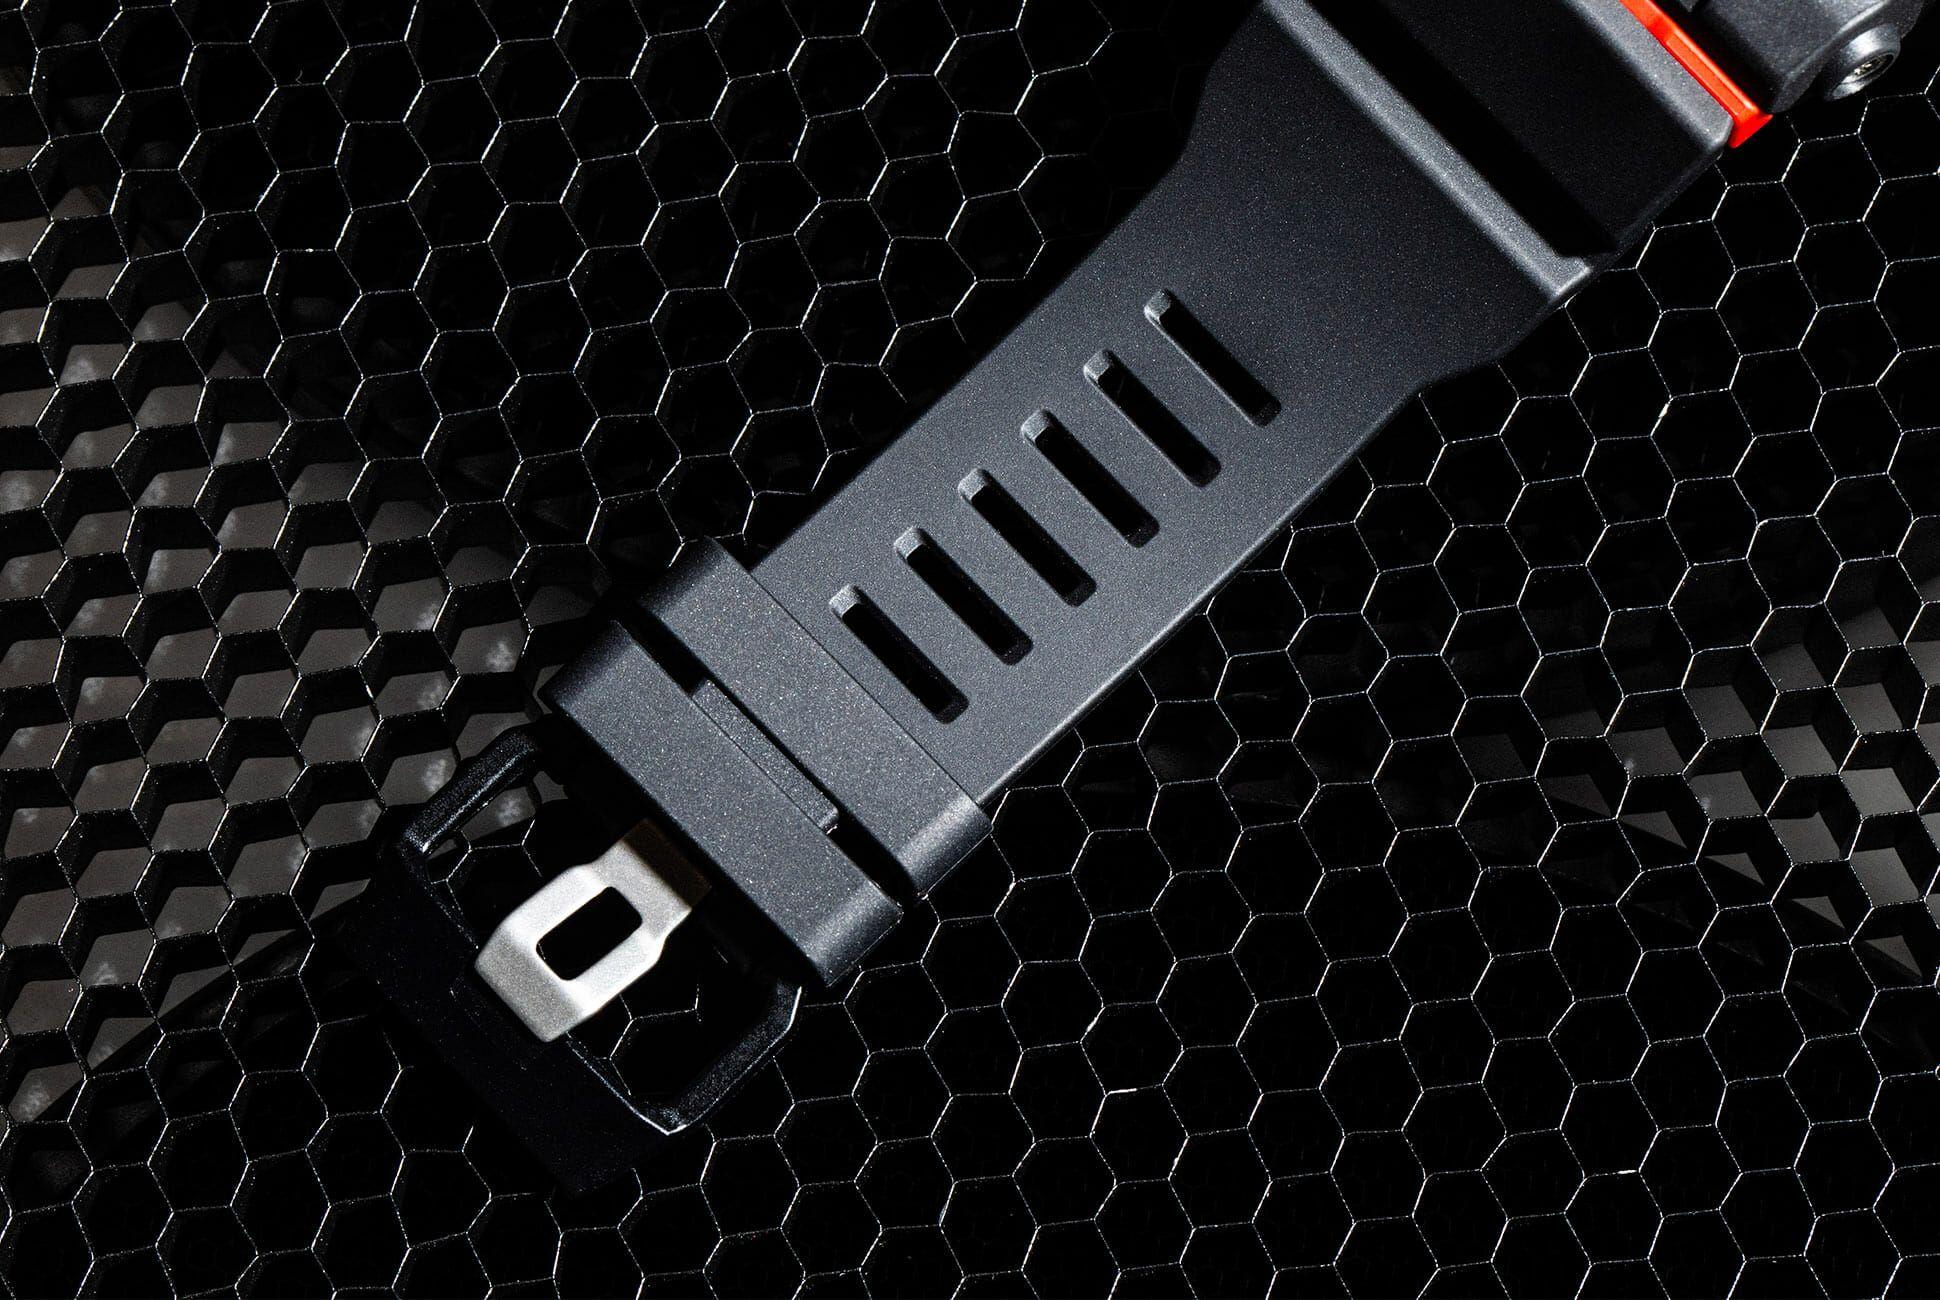 Sponsored-Casio-G-Shock-GBD800-gear-patrol-slide-4